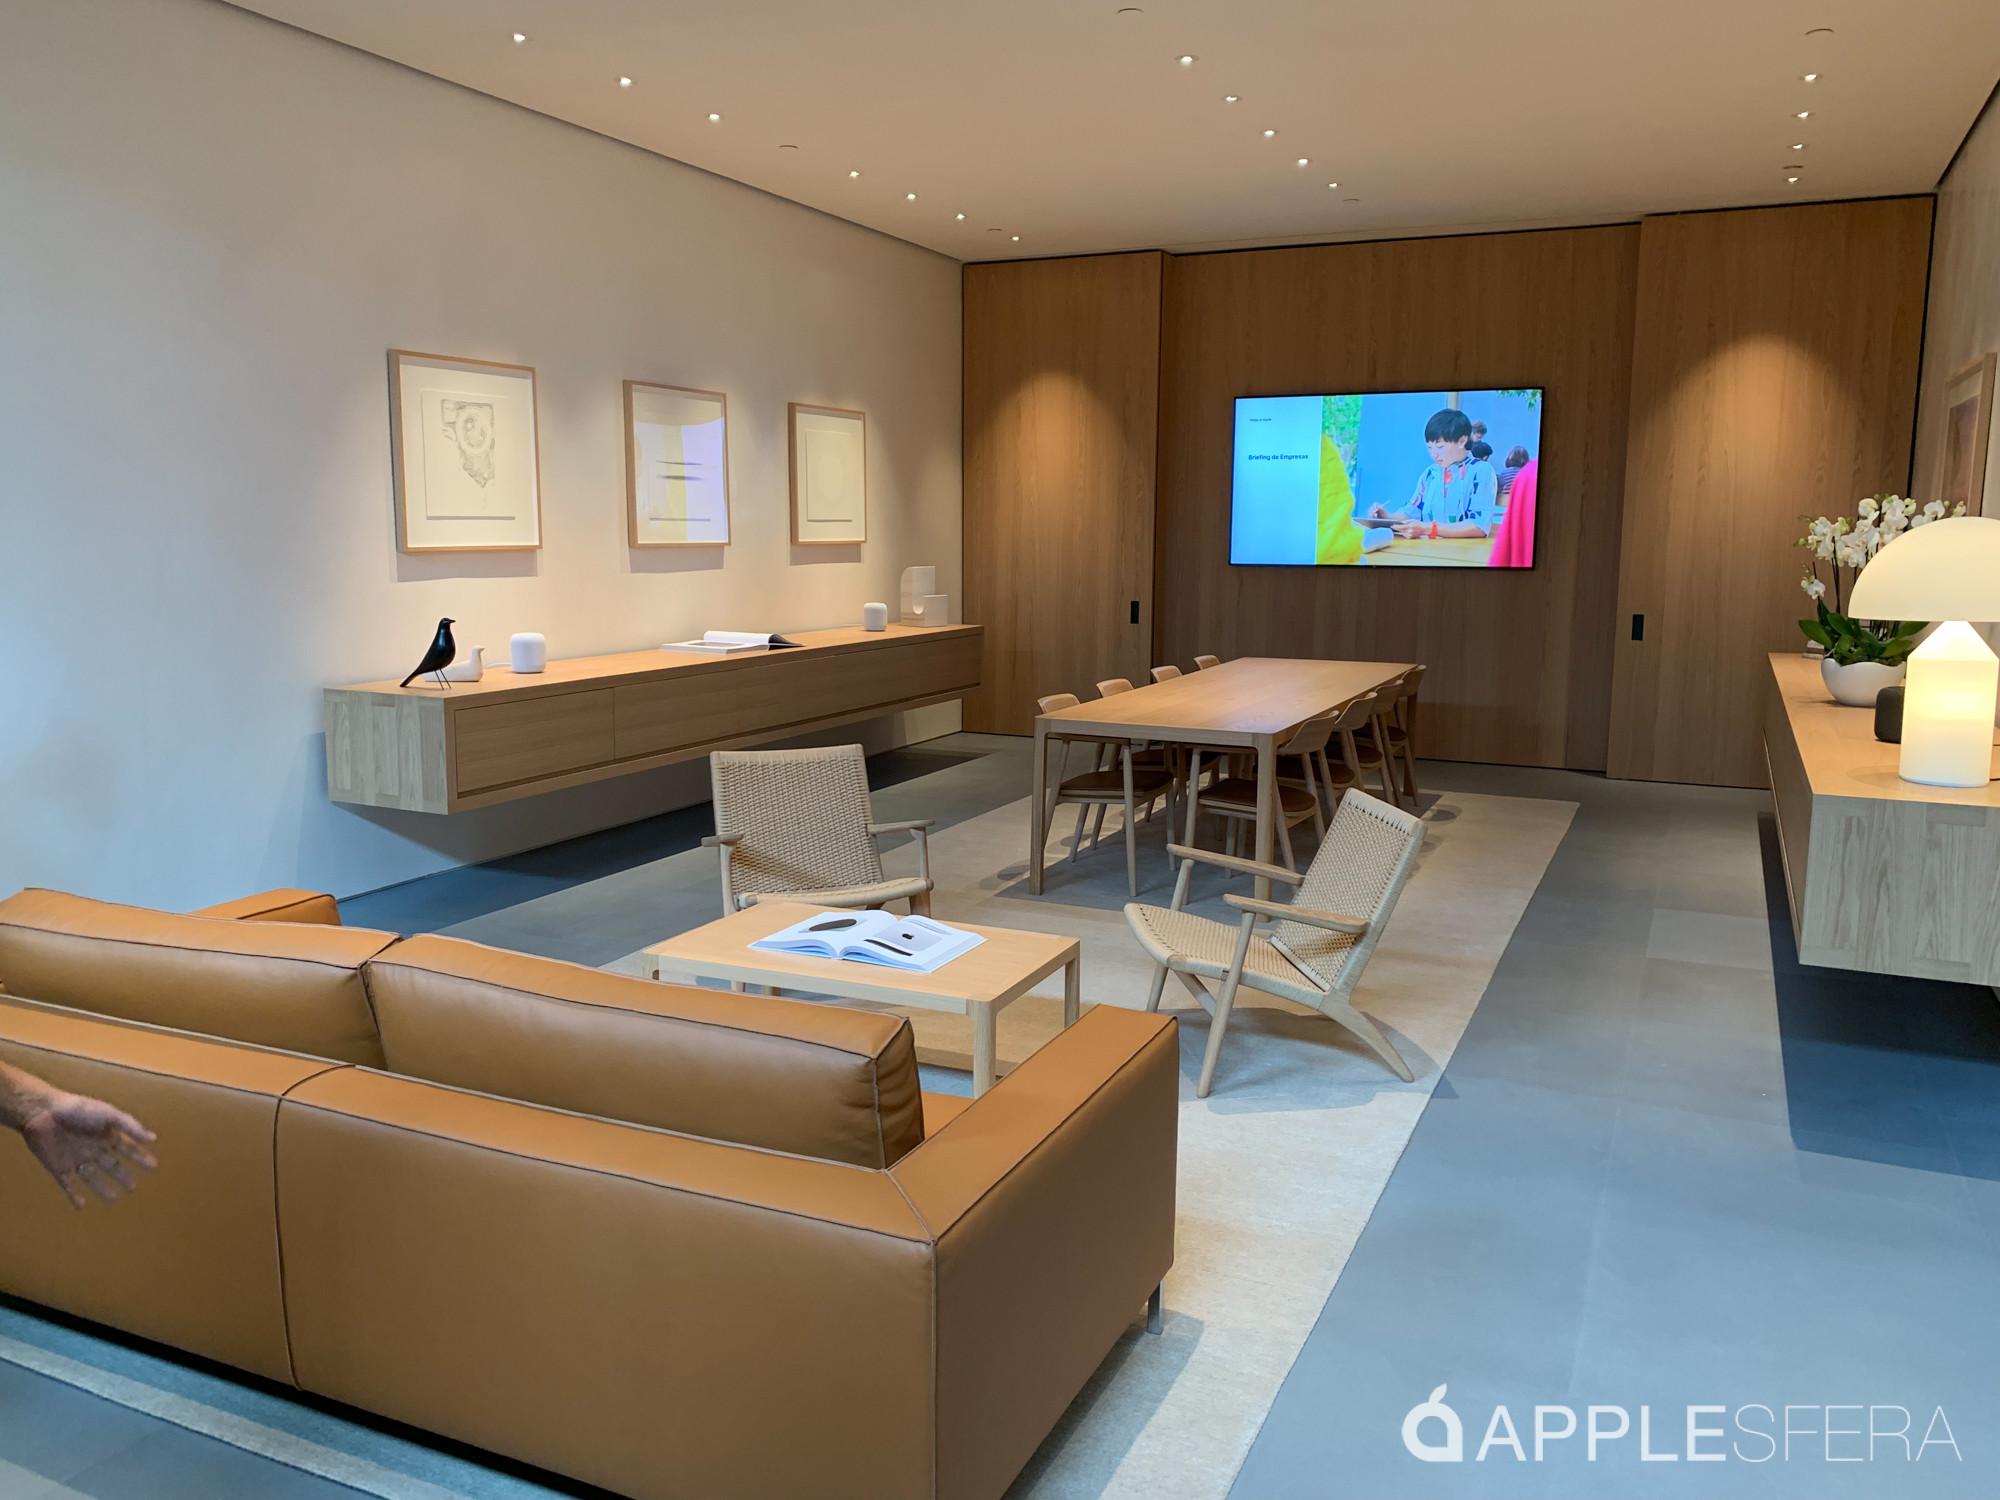 Foto de Apple Store Passeig de Gràcia (8/28)